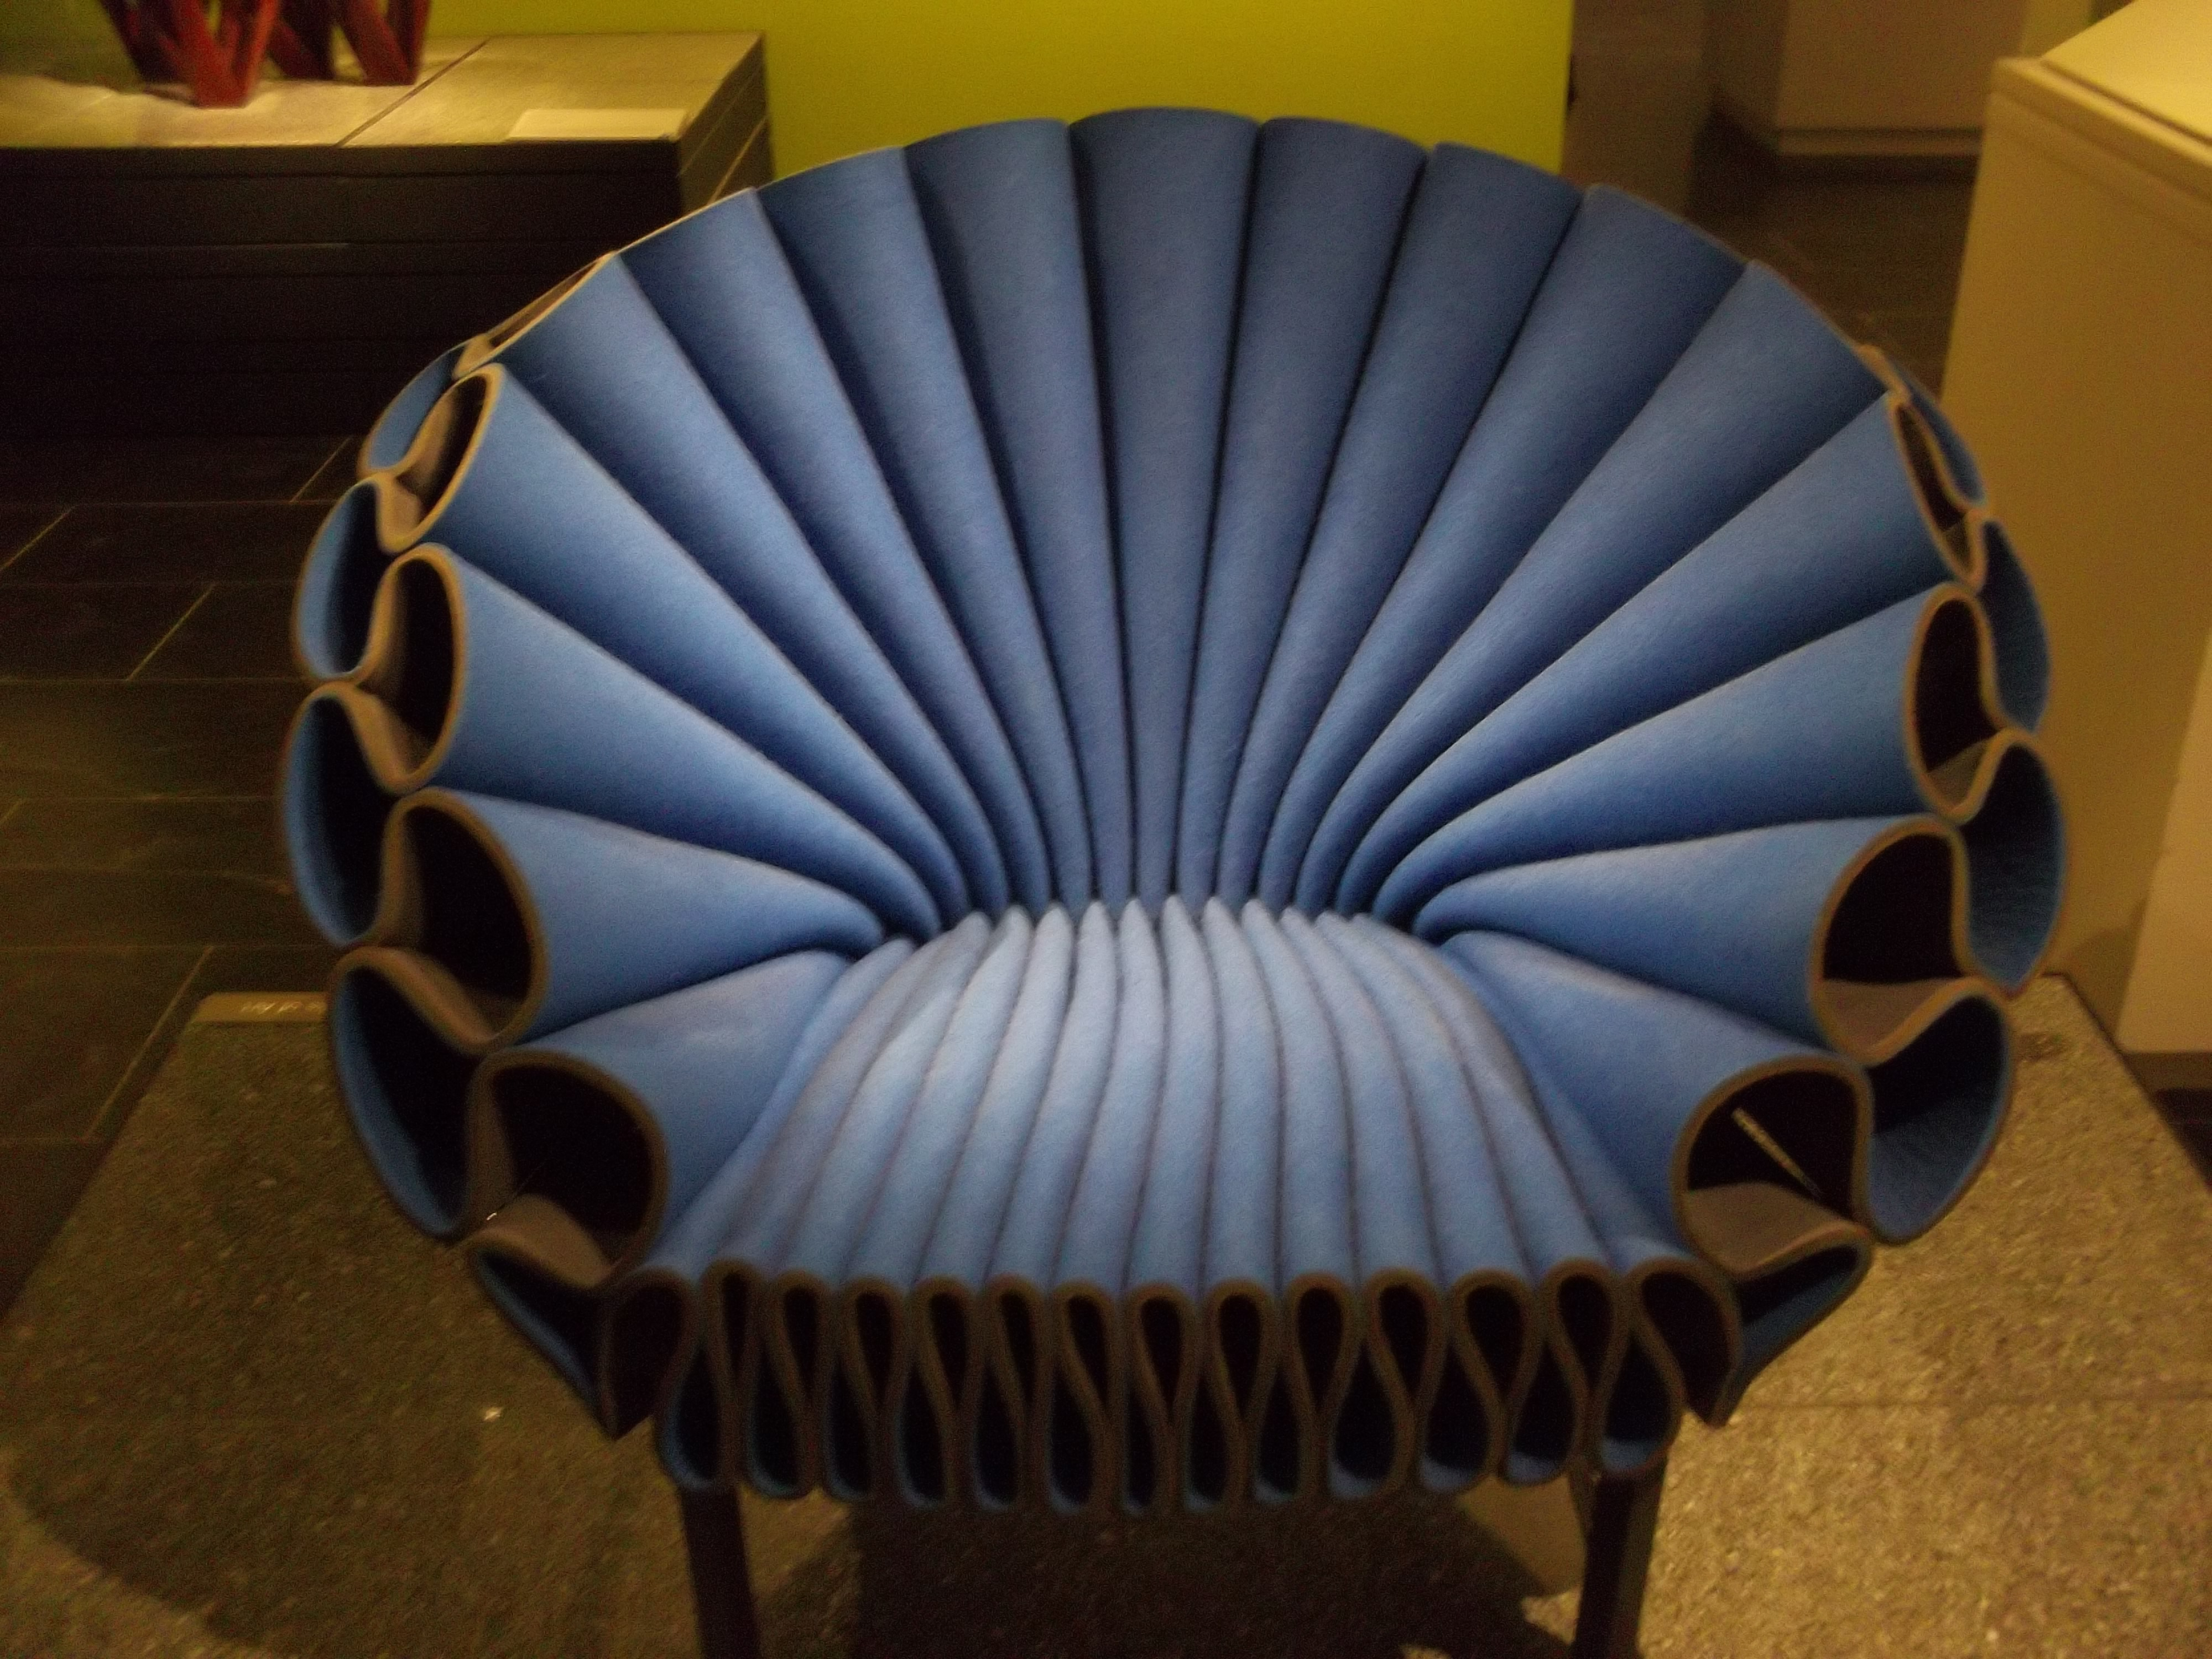 Peacock Chair By Dror Benshetrit